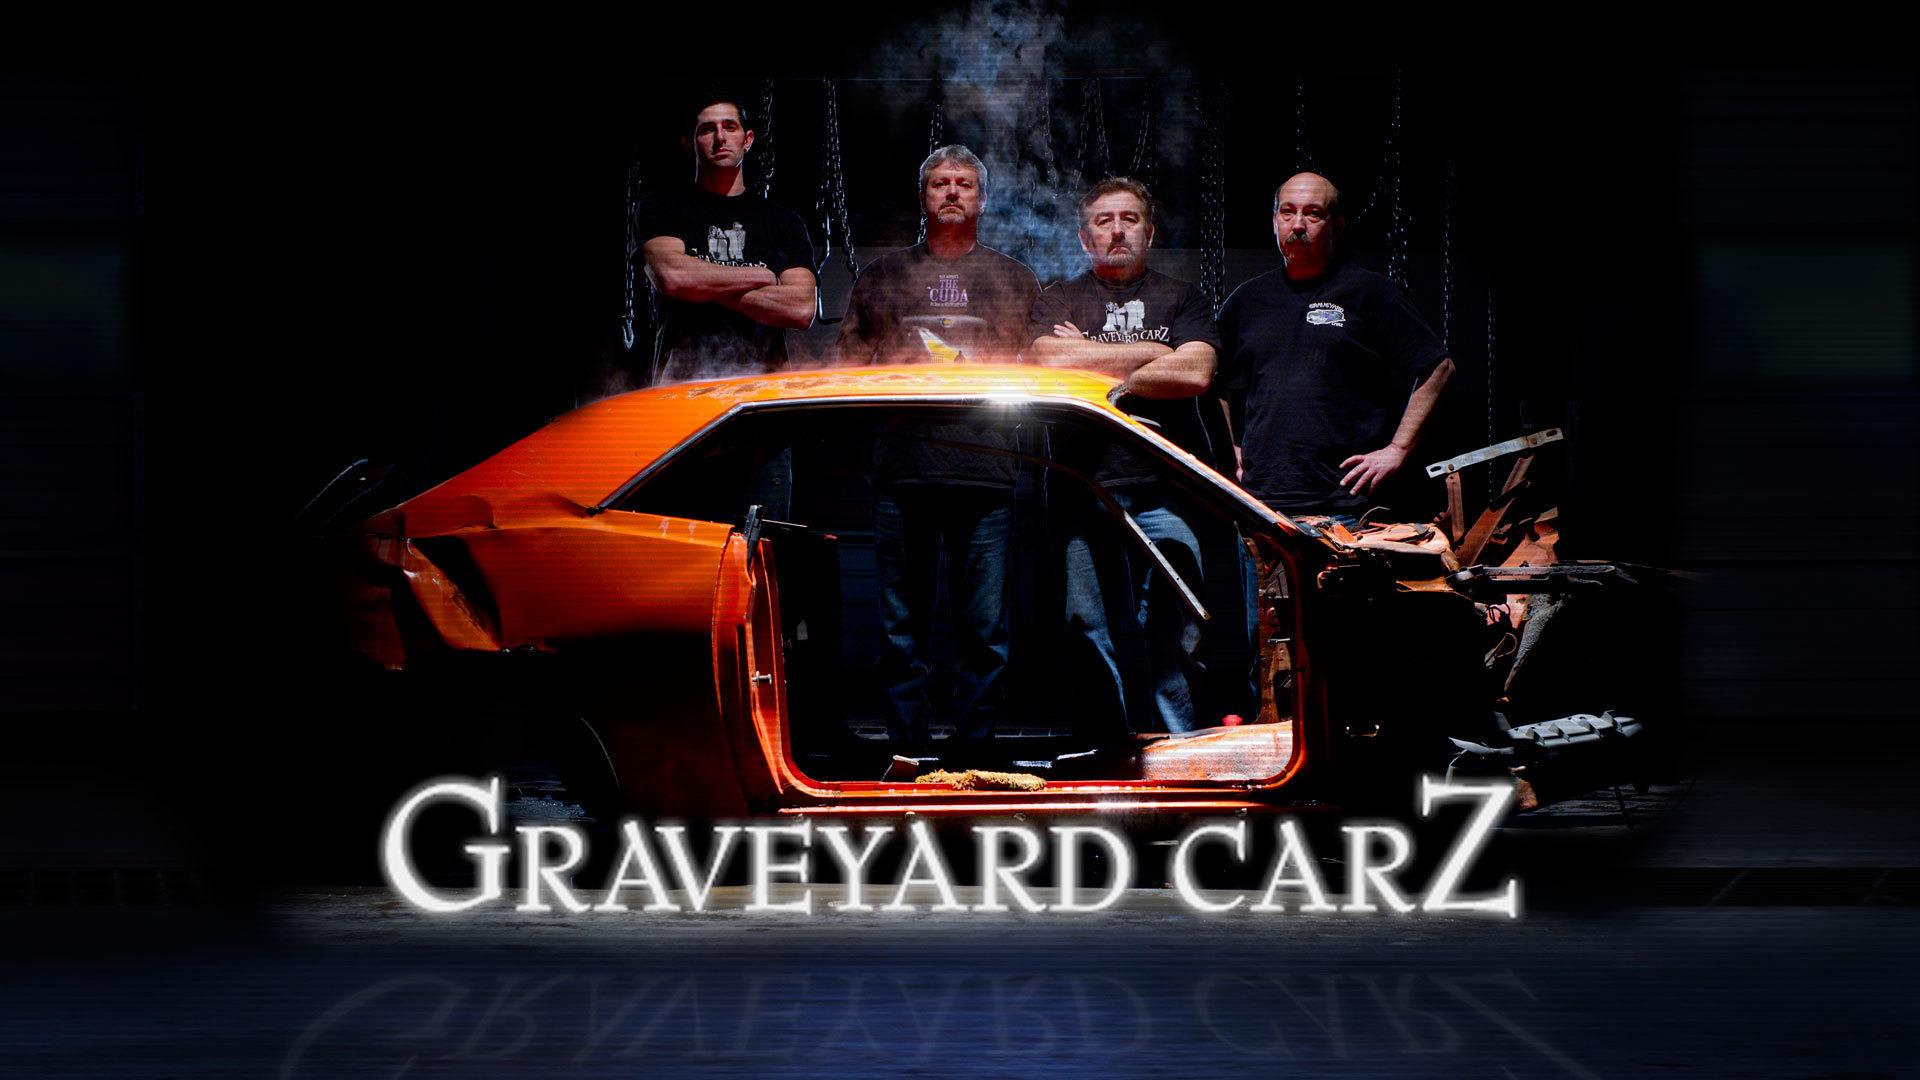 Show Graveyard Carz